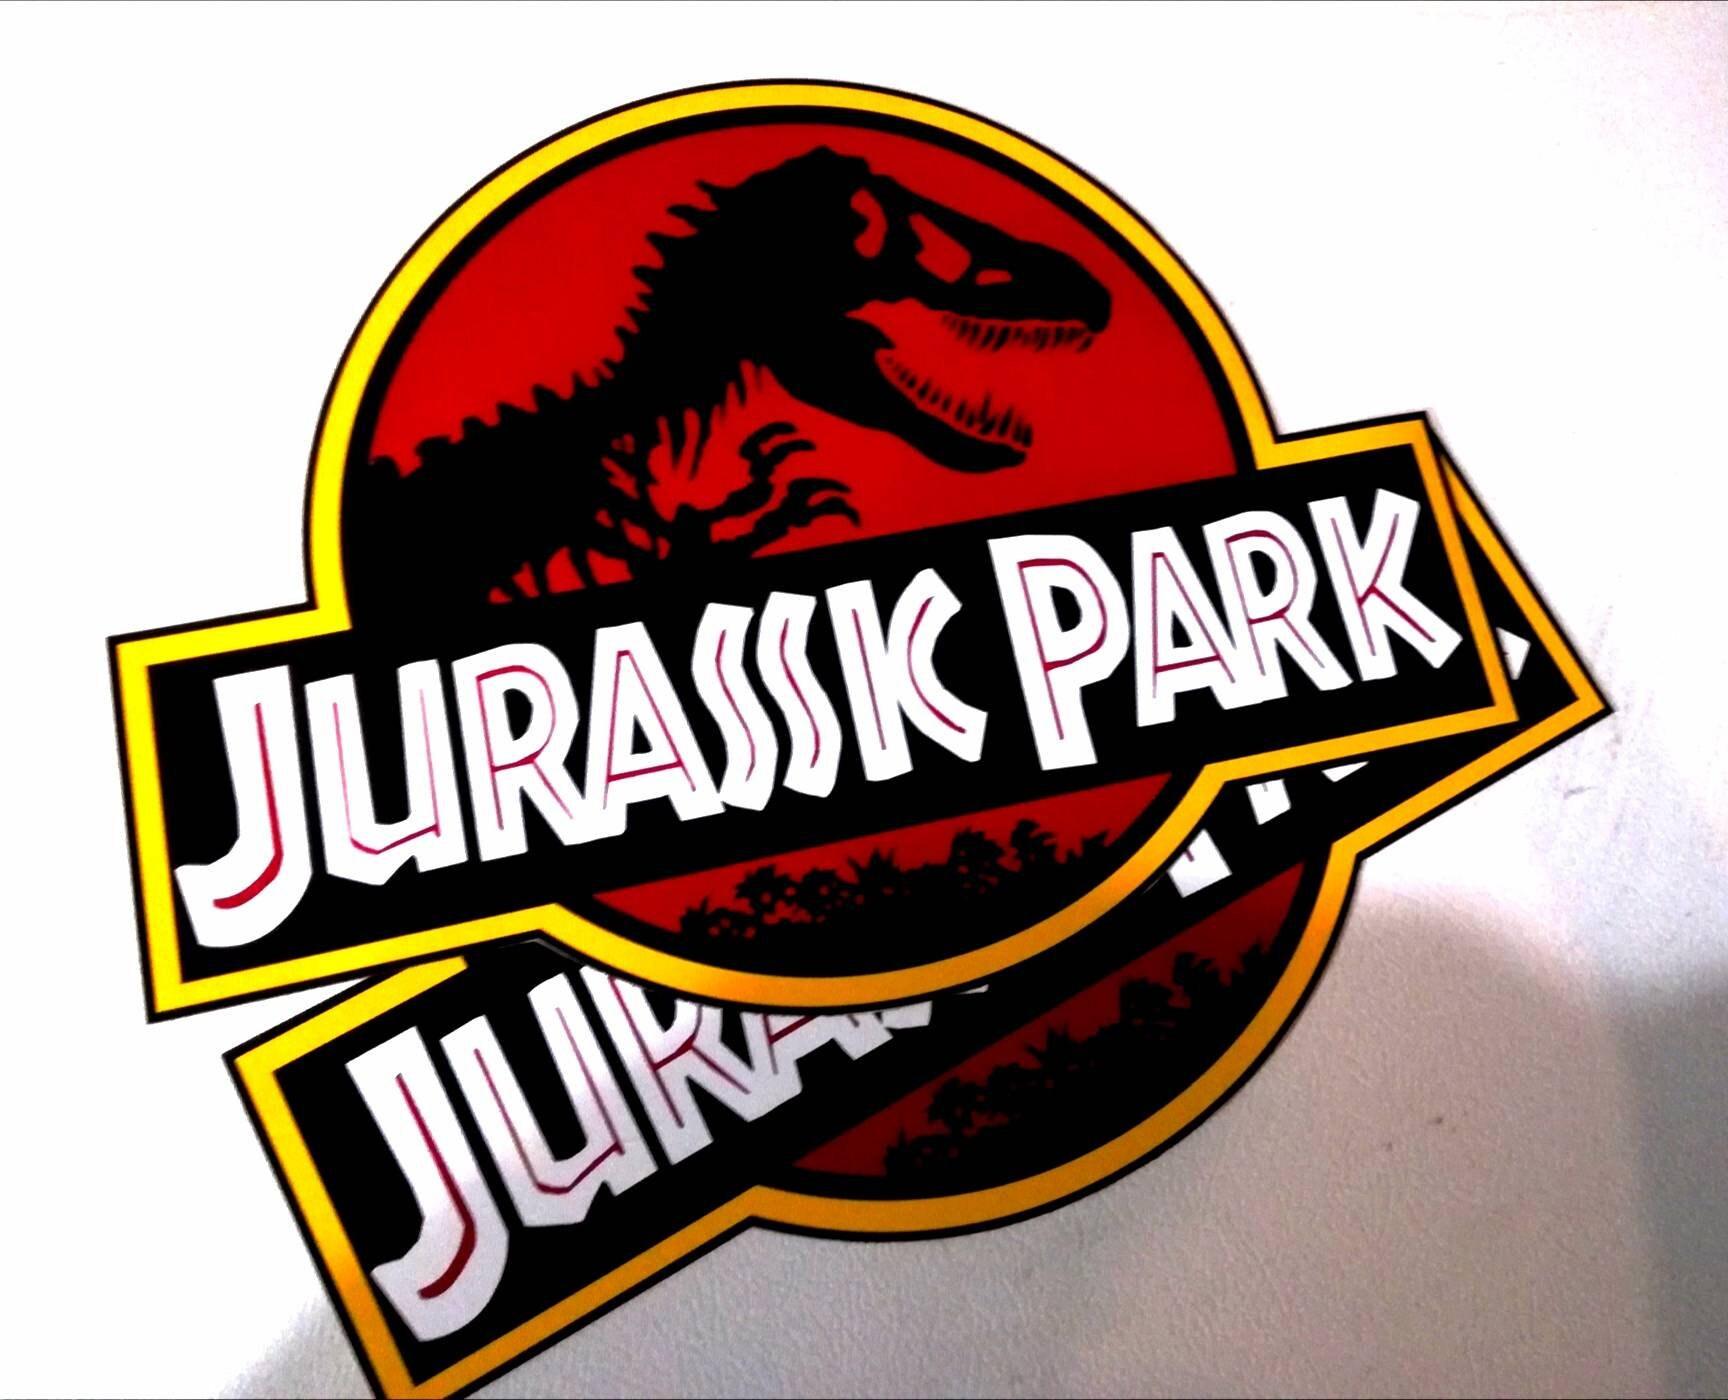 Jurassic Park Door Vinyl Decal sticker Kit Jeep Rubicon ...